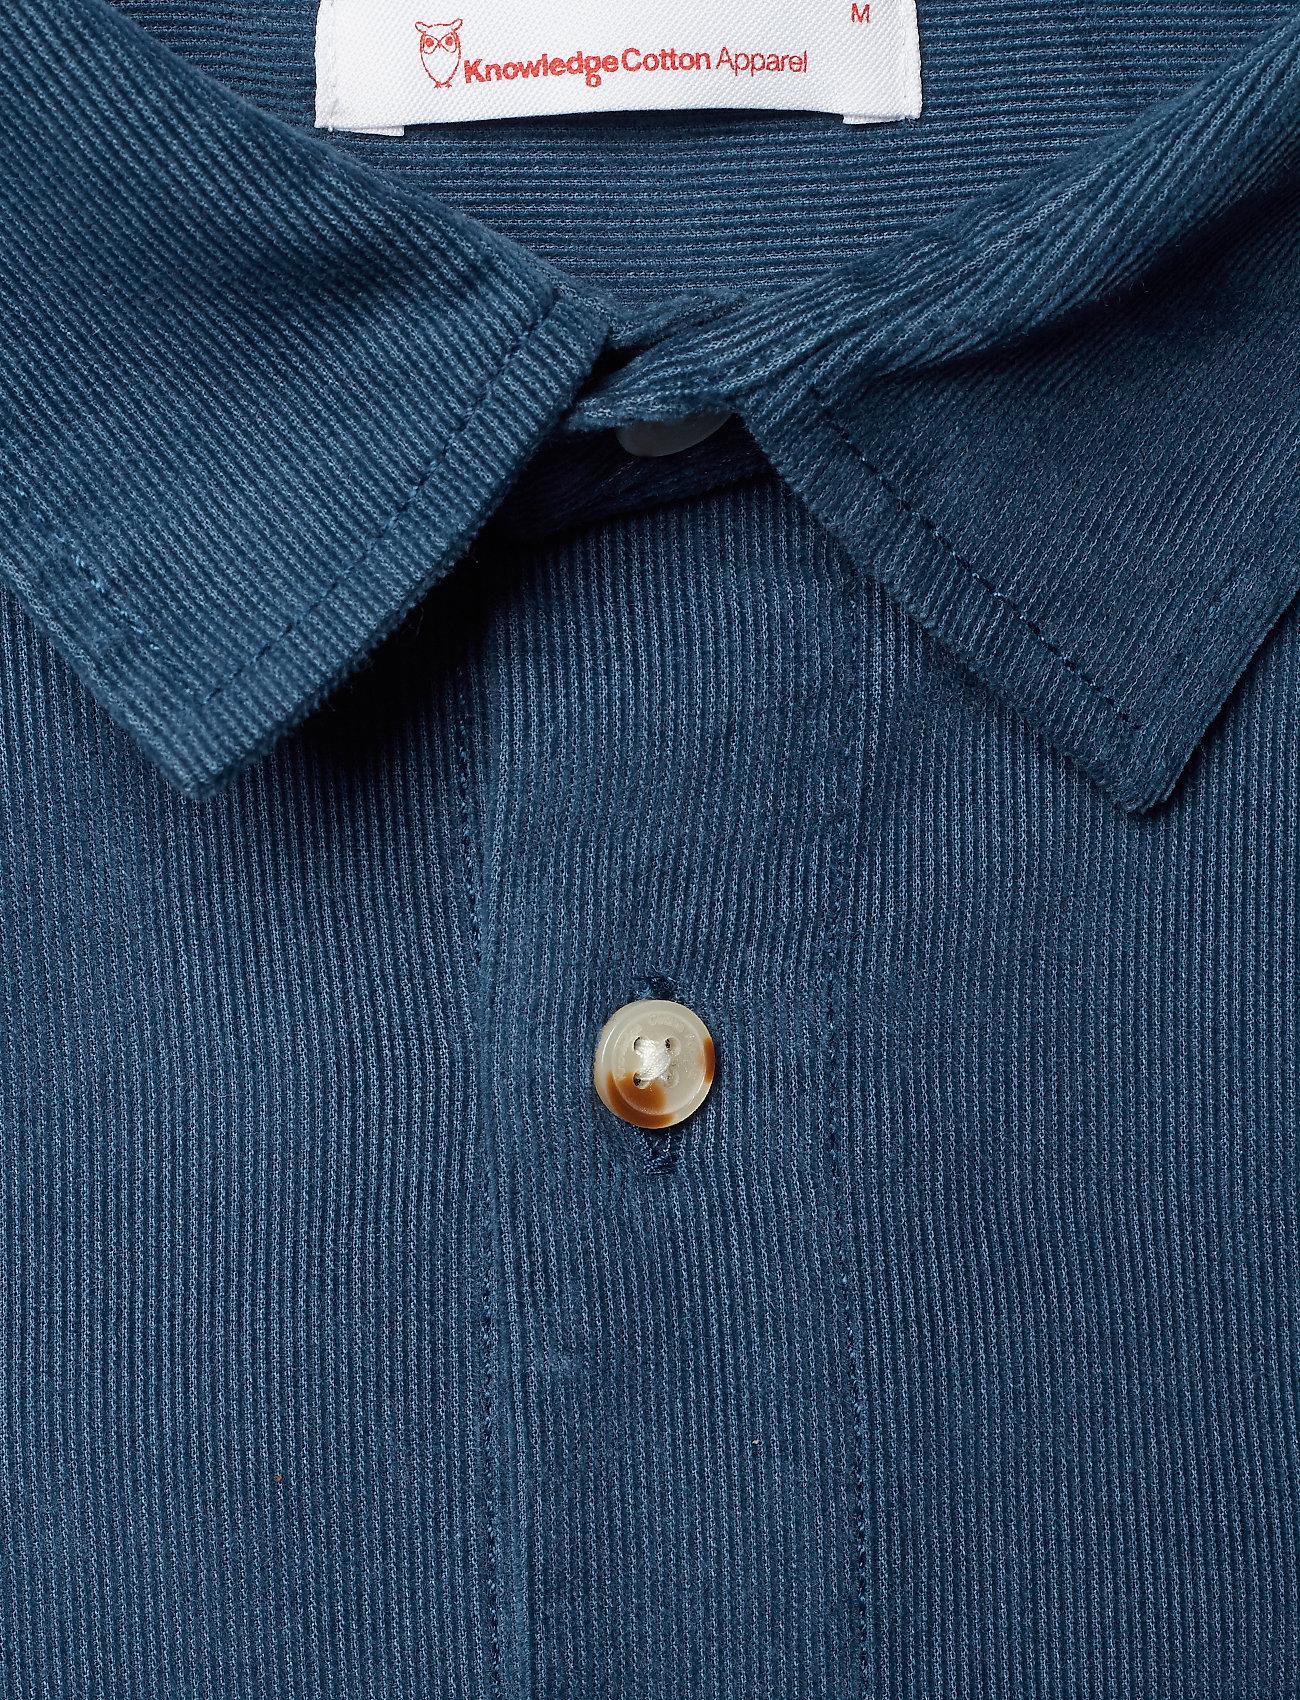 Cotton DenimKnowledge Baby Shirtdark Apparel Cord shrtdxQBC